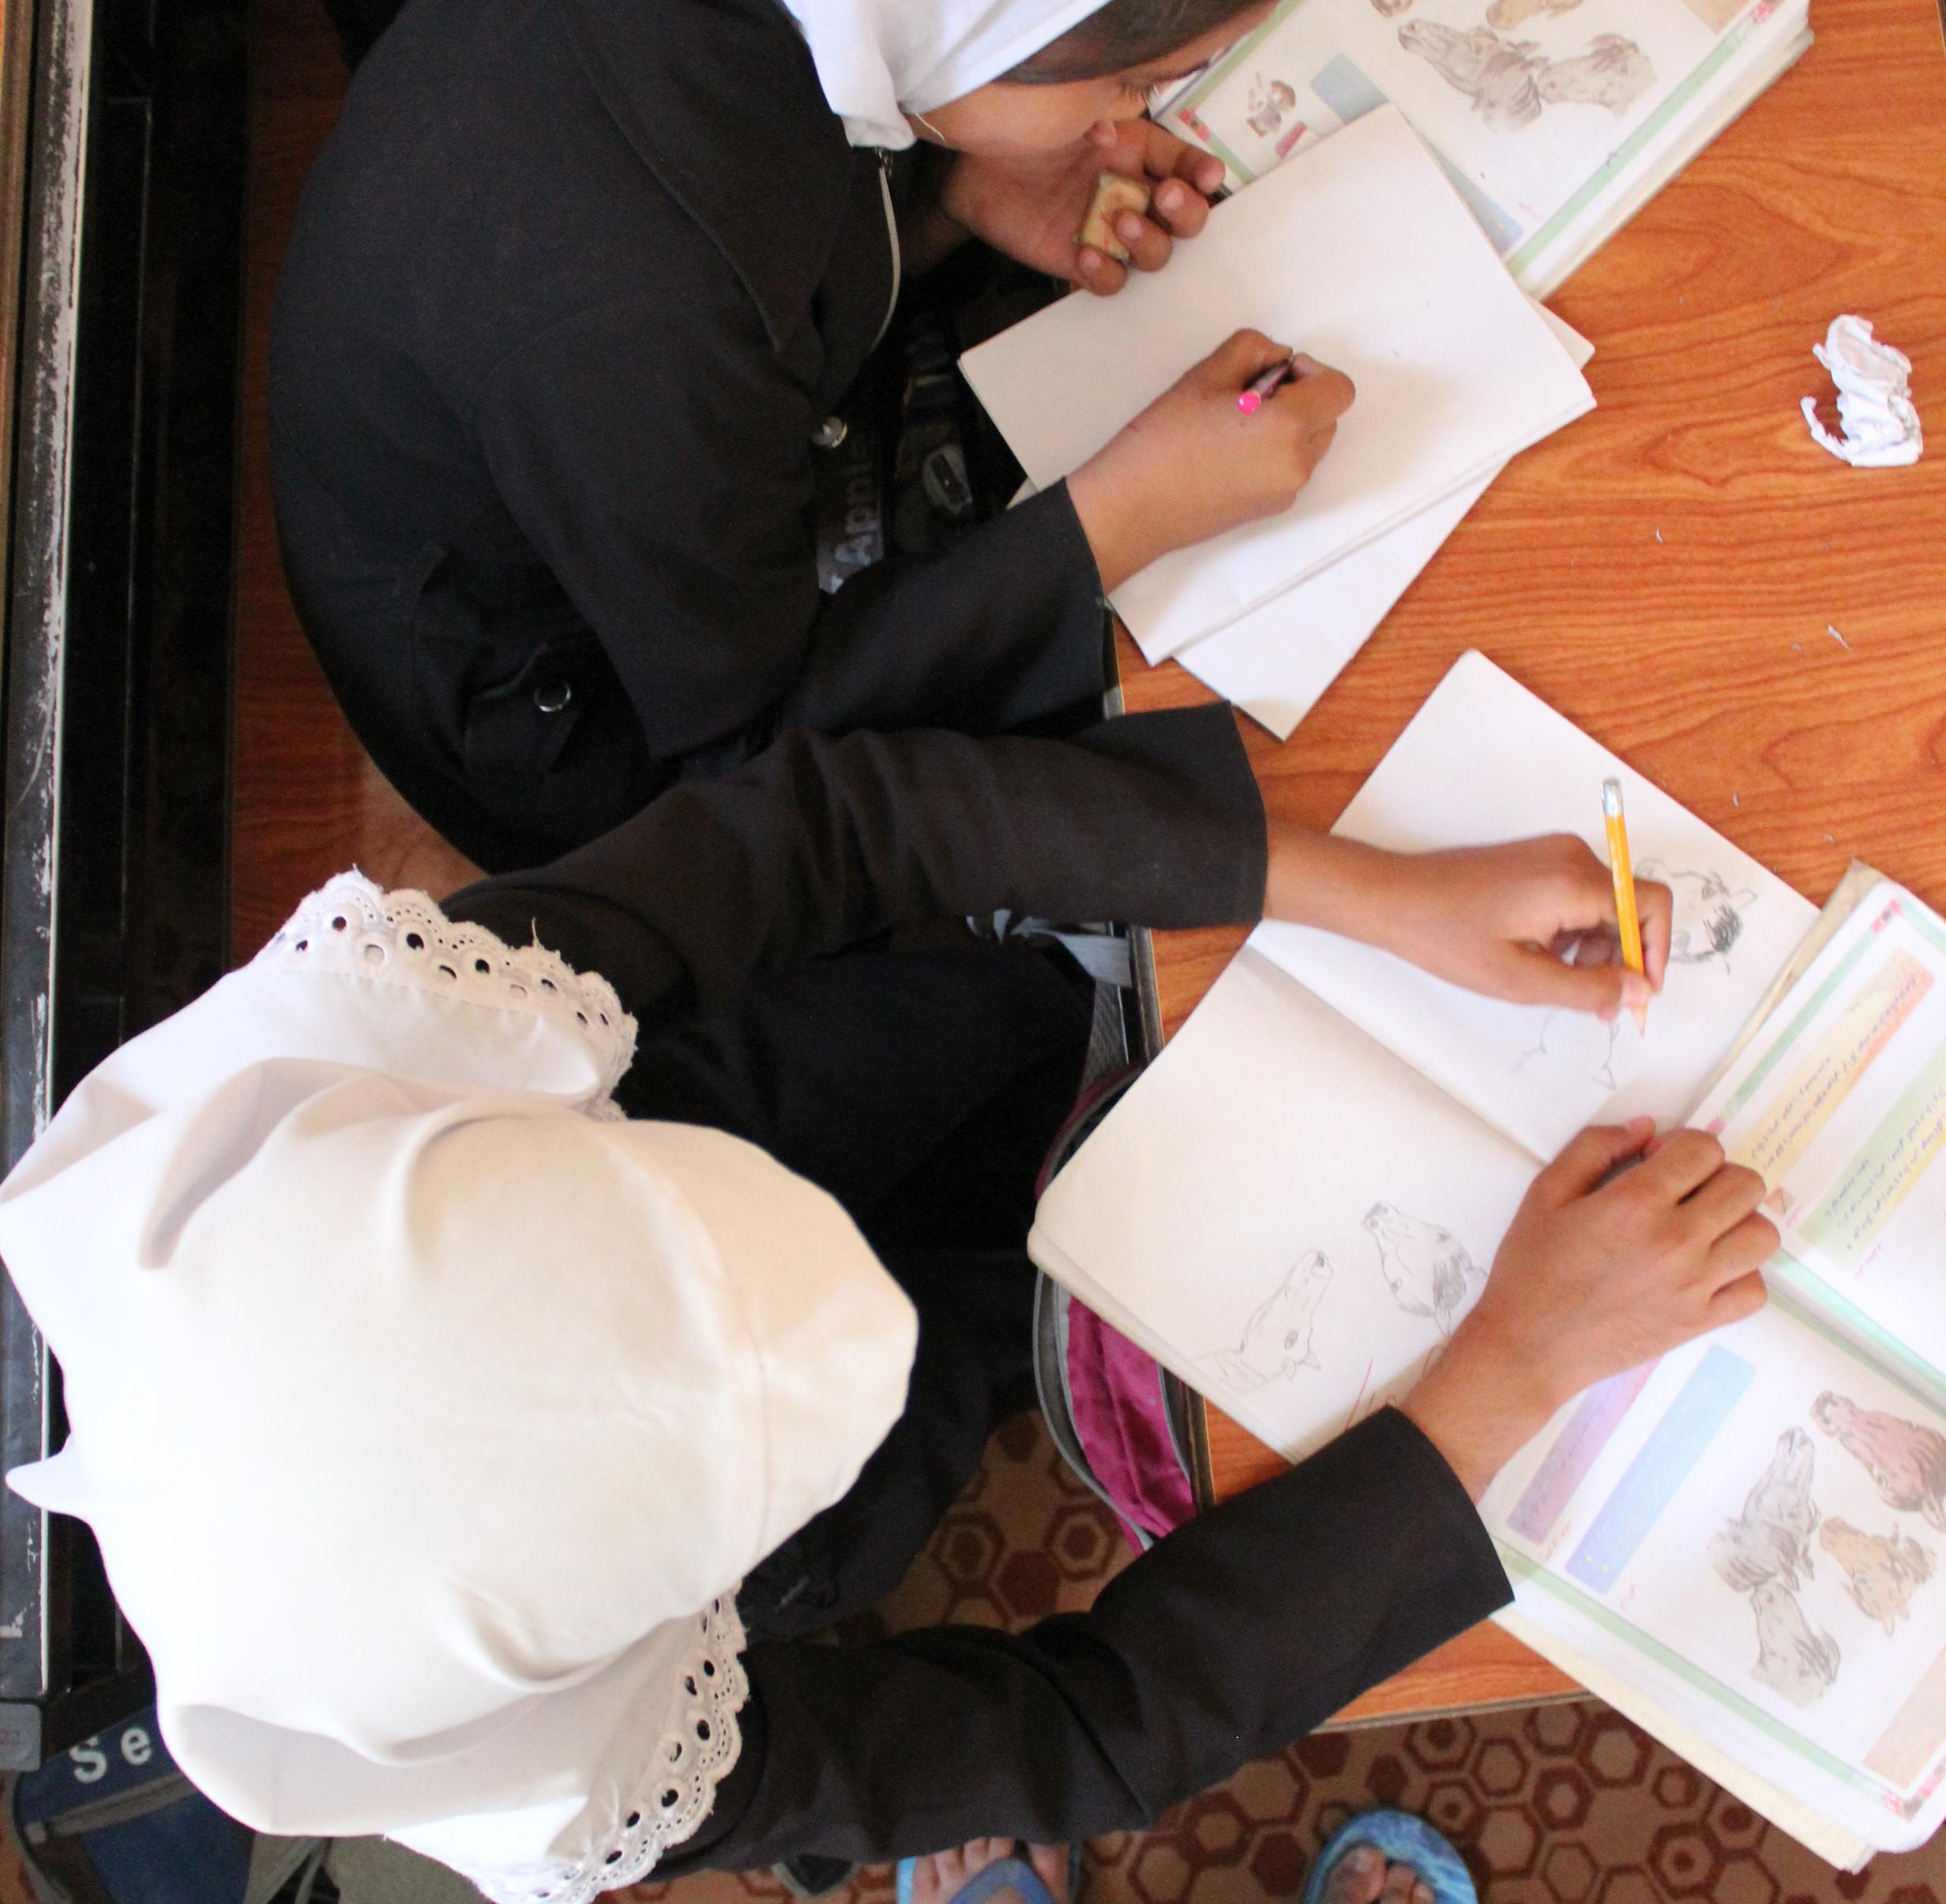 Razia - #3030 | FemaleAge When Starting School: 9